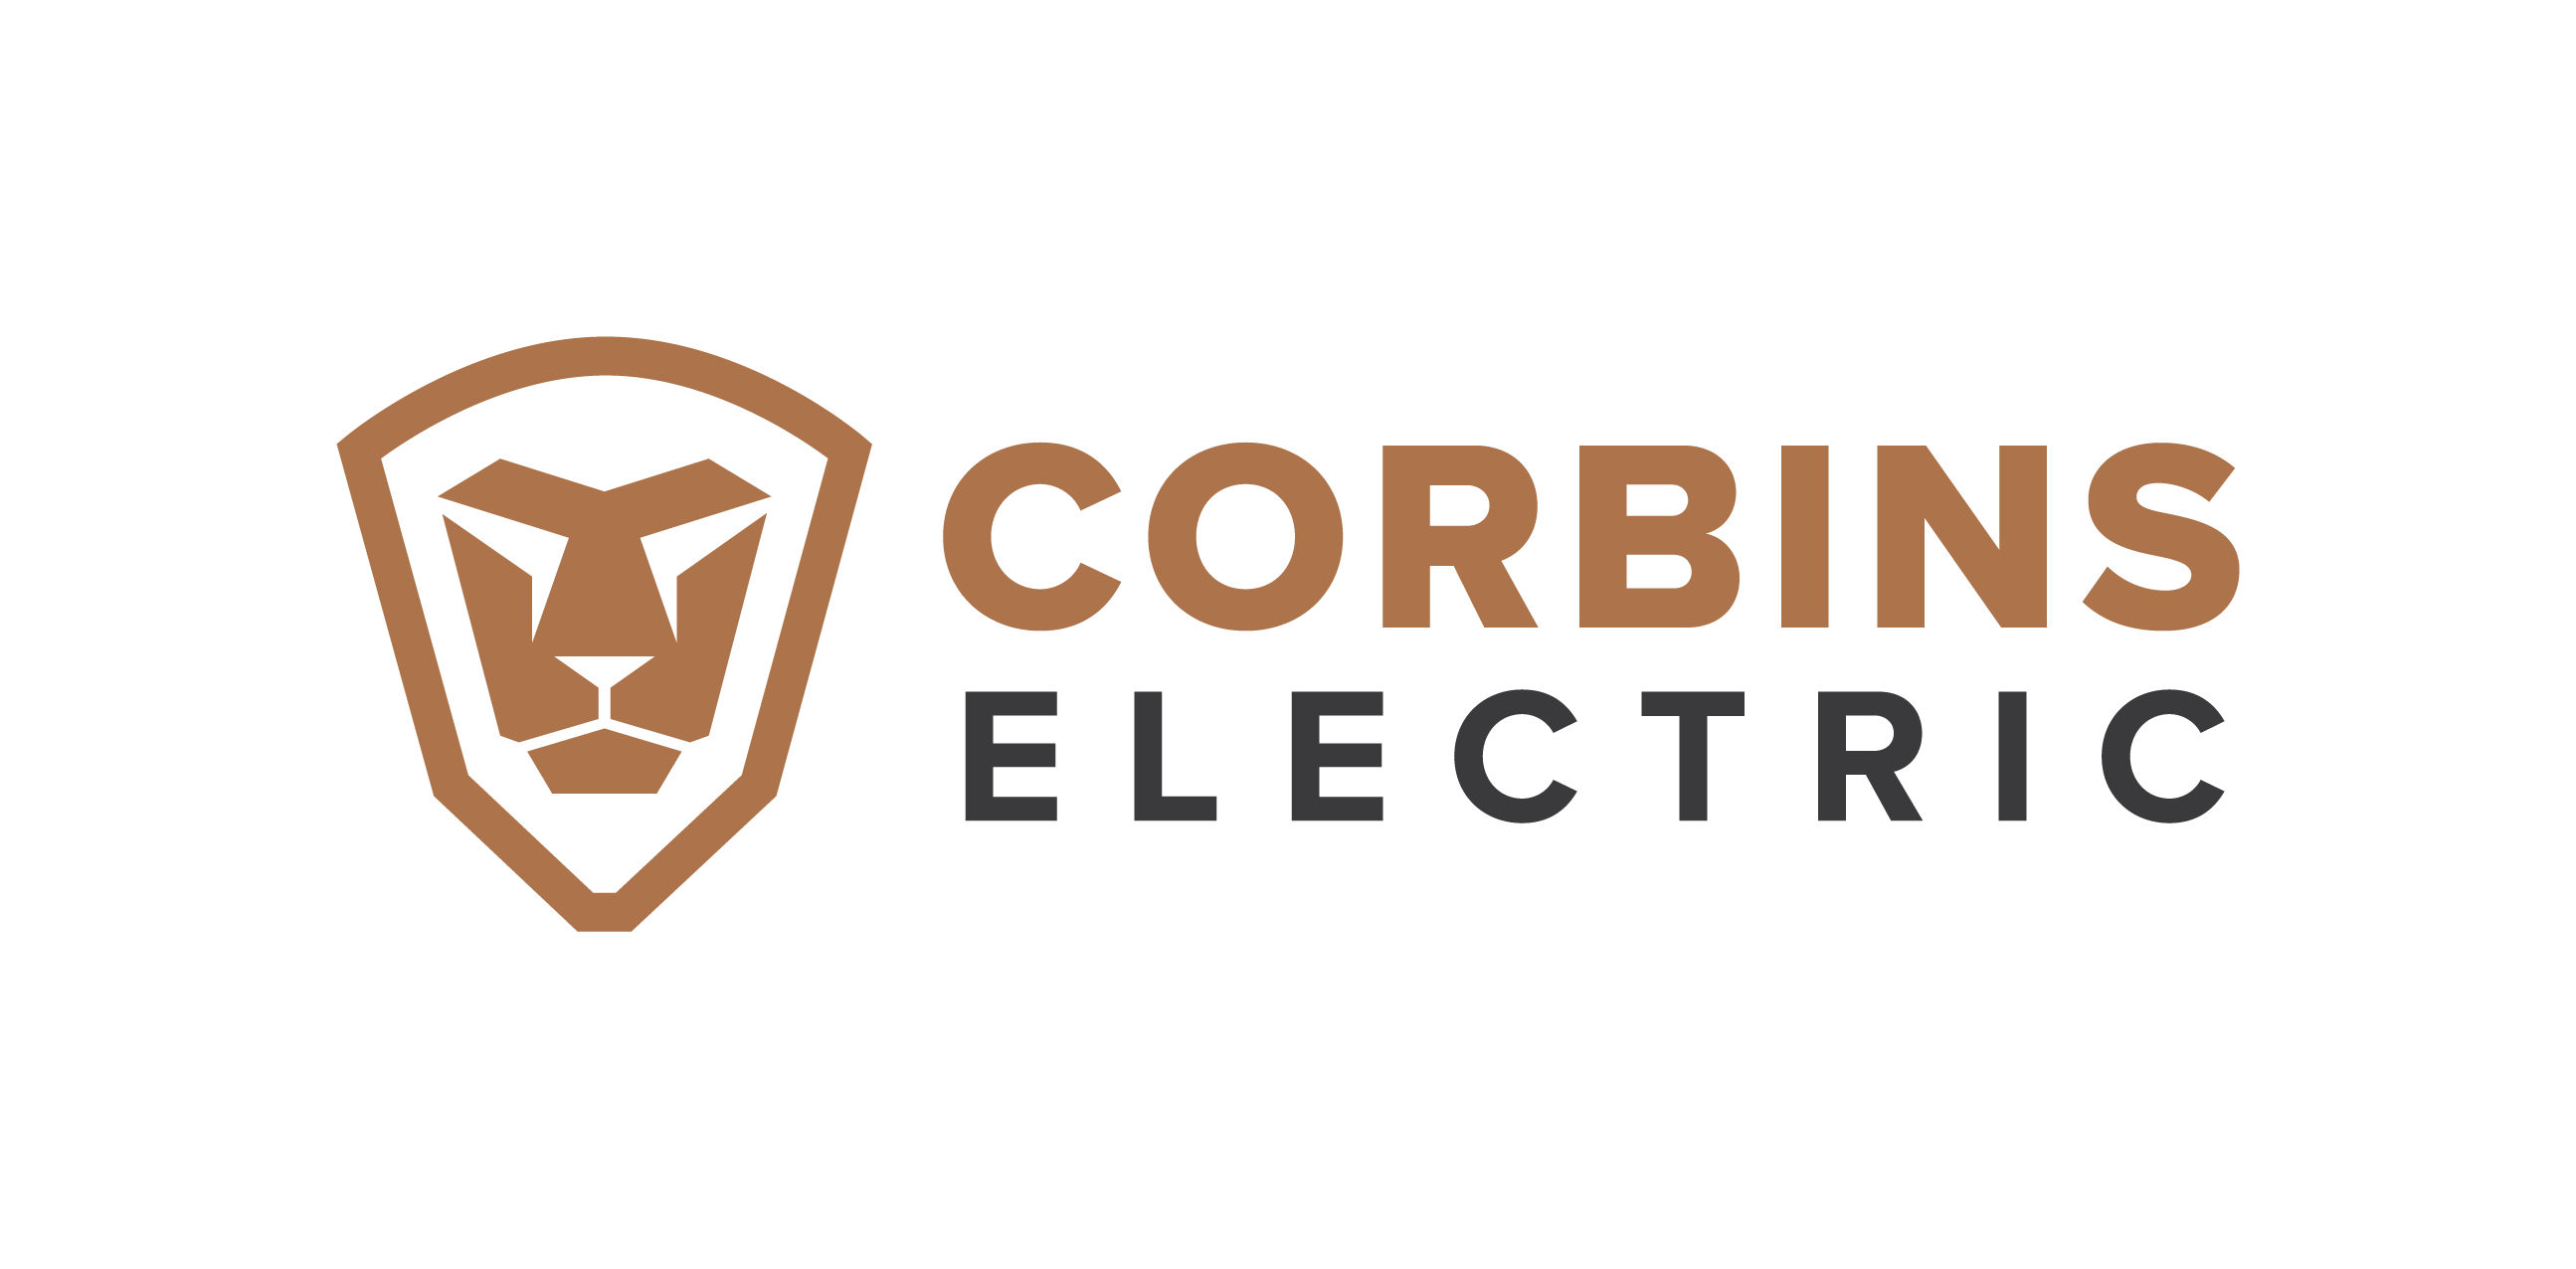 Corbins Electric Company Logo